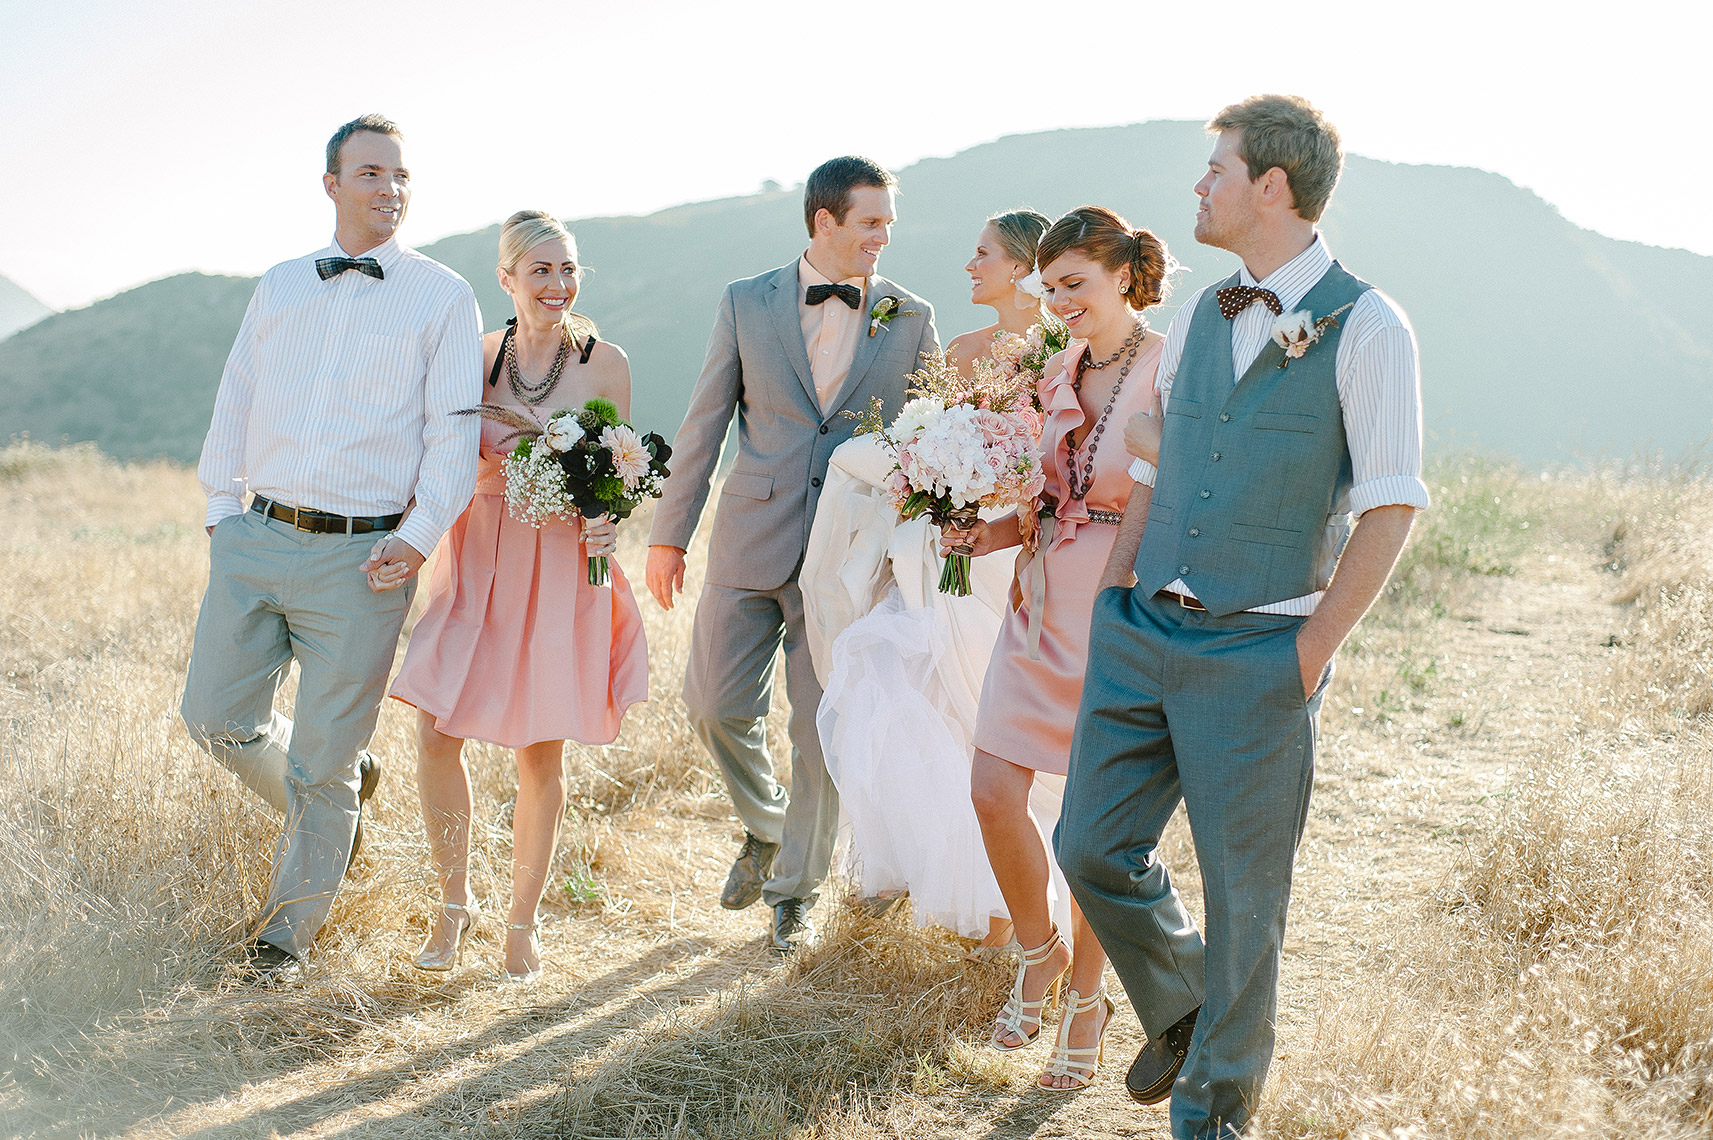 john-schnack-photography-san-diego-wedding-inspiration-shoot-back-country-vintage-wedding-40.jpg